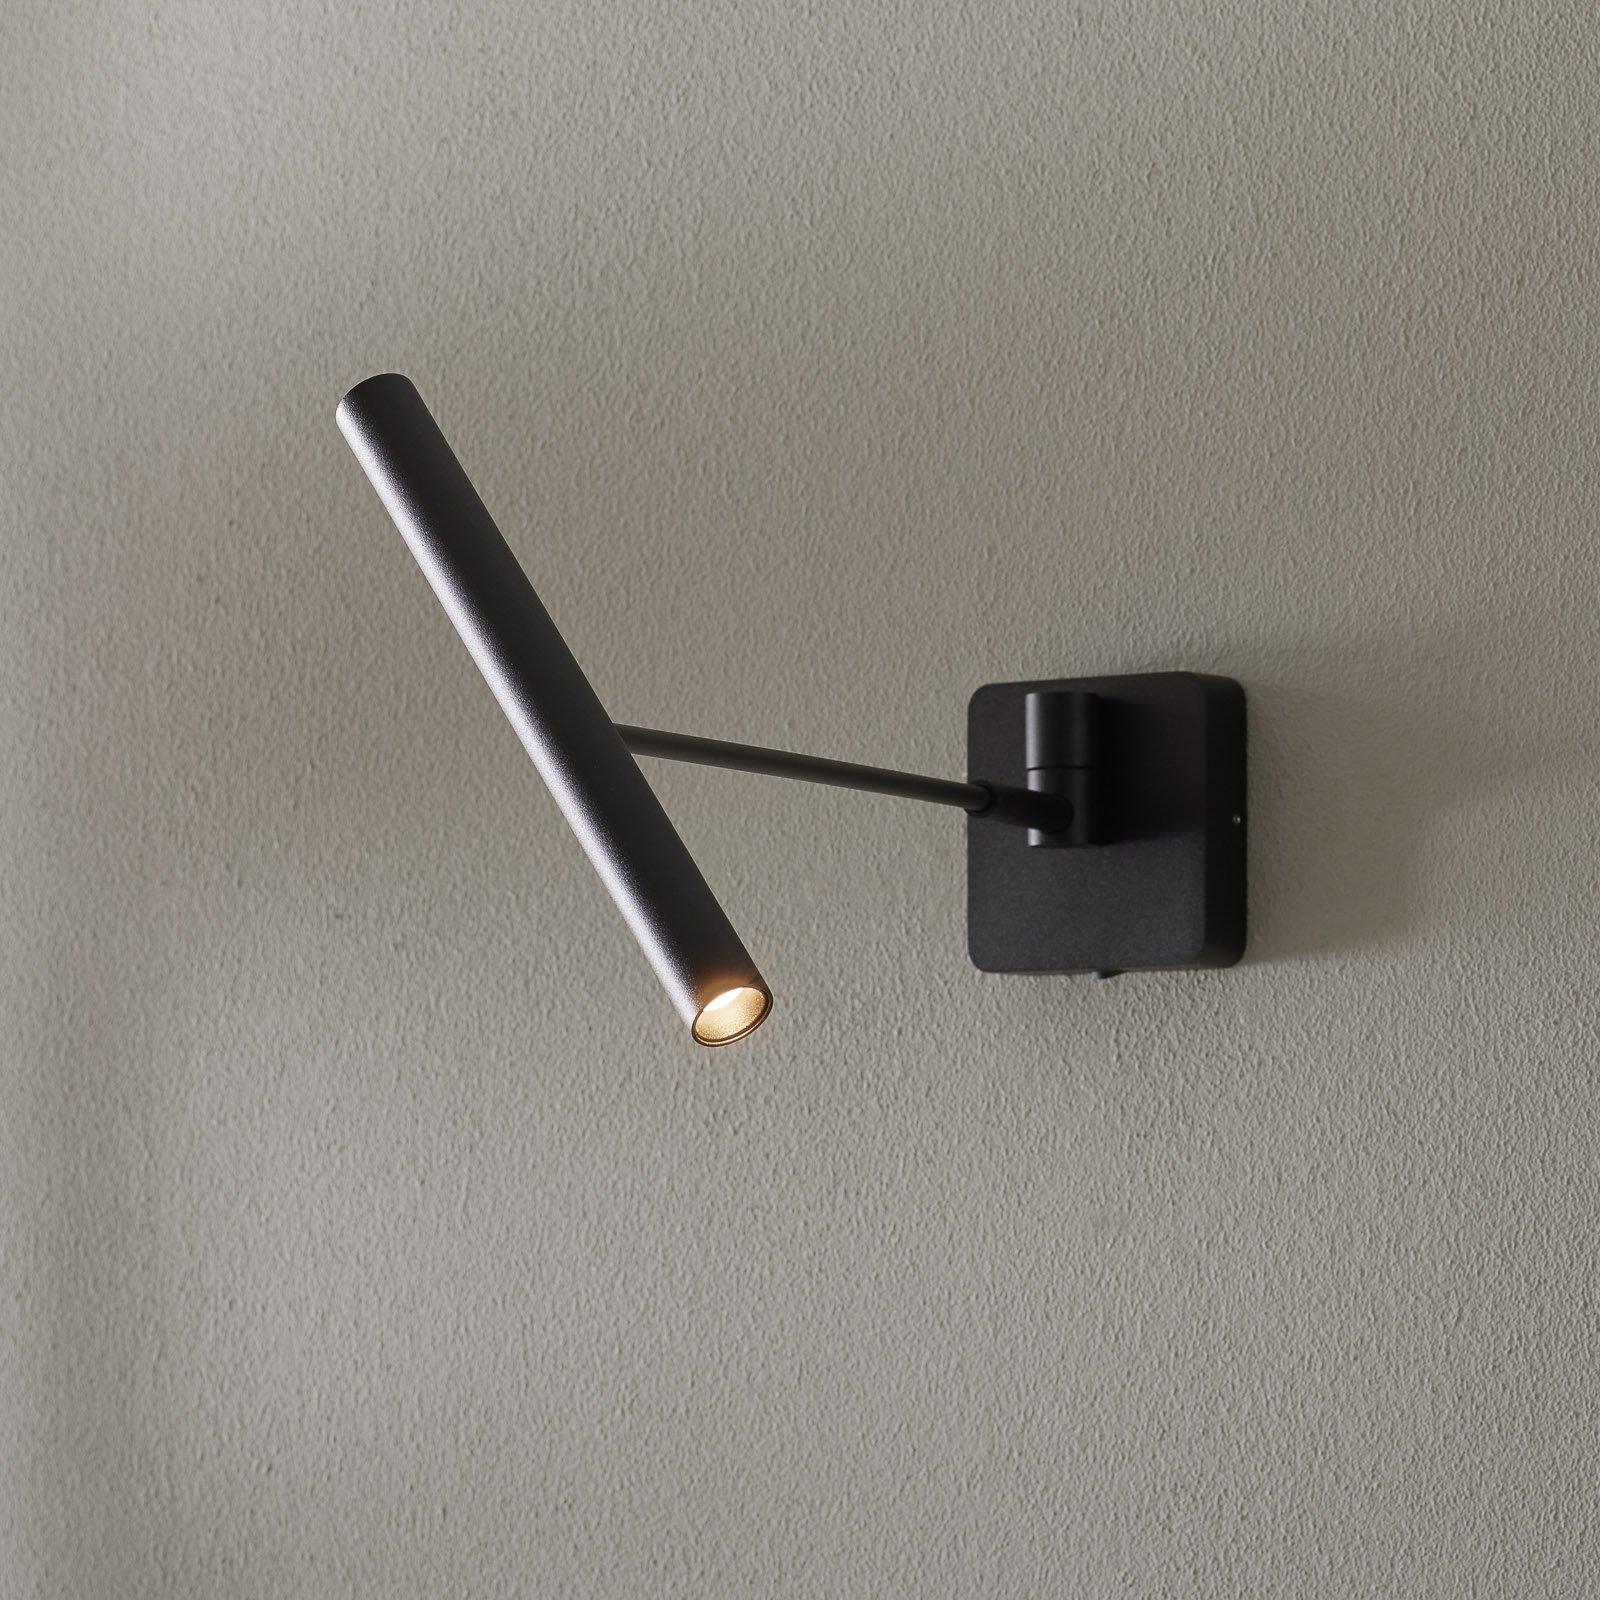 Wygo LED-vegglampe dimbar, vippbar, svart